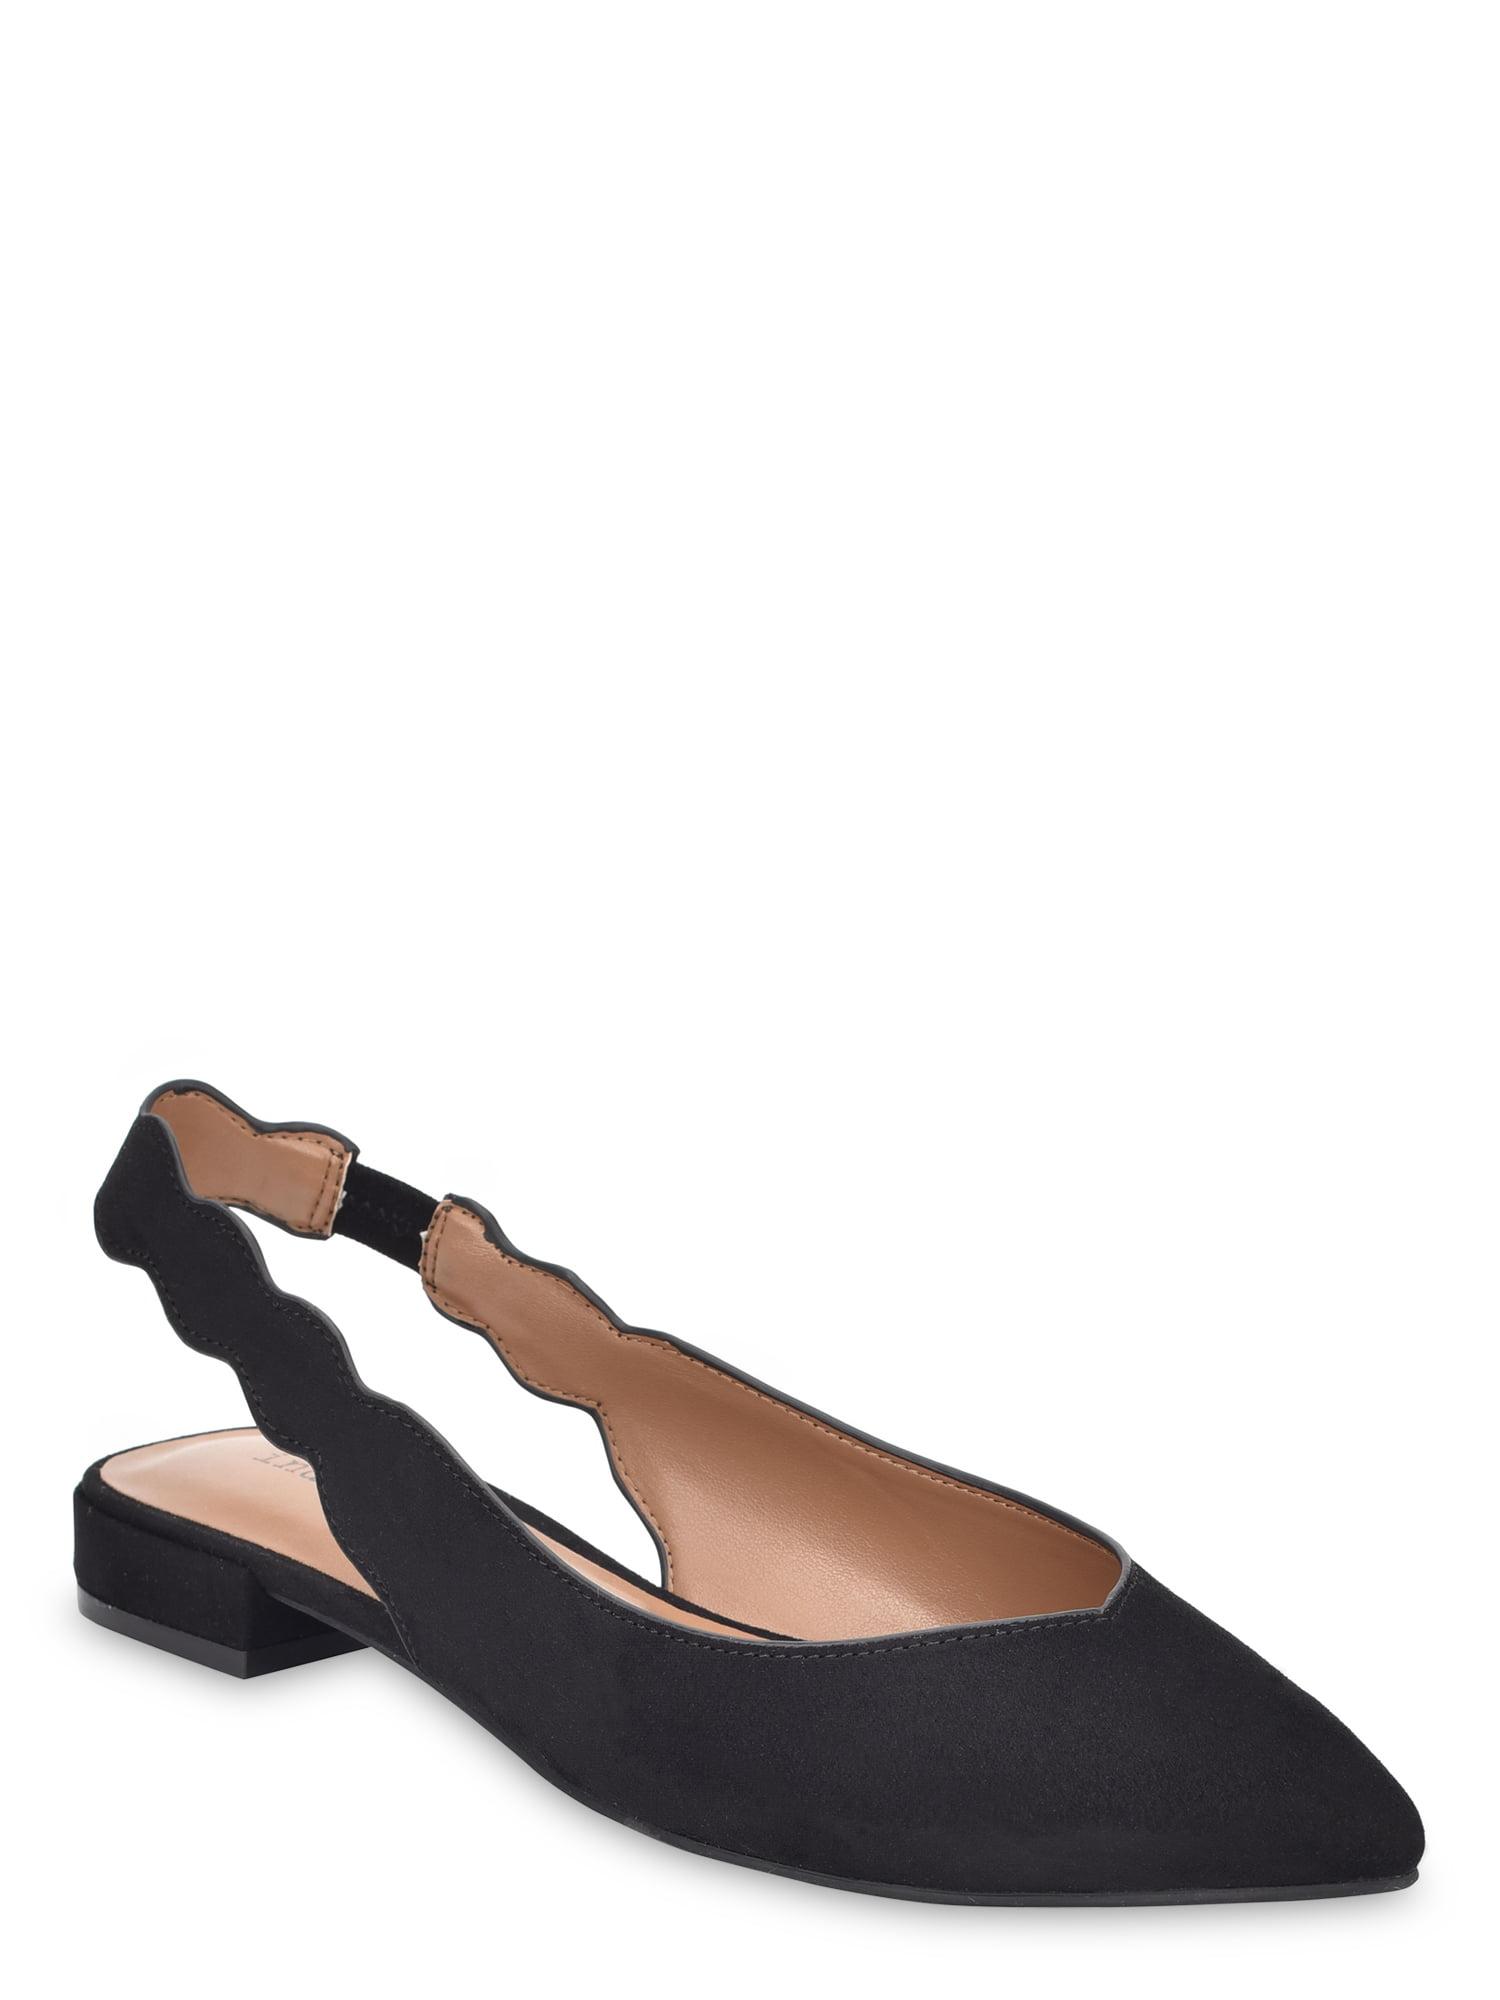 Indigo Rd. Black Gabrie Scalloped Slip